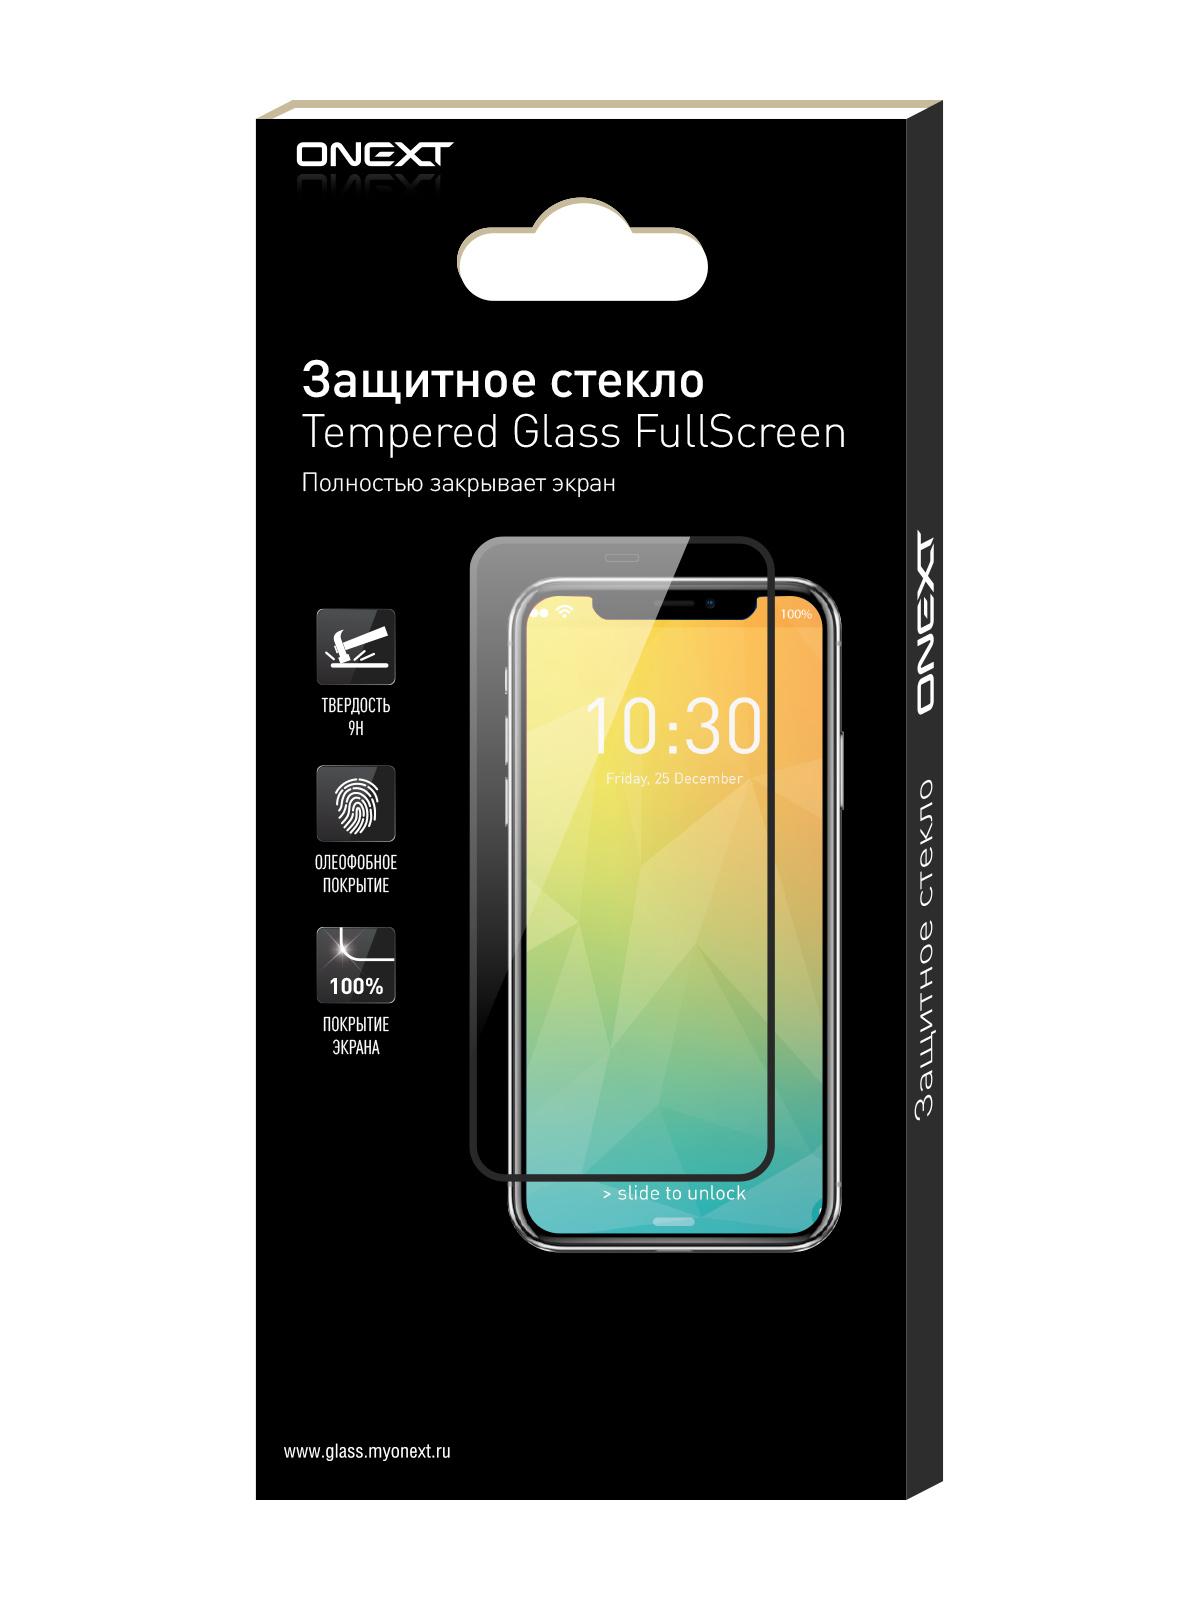 Защитное стекло ONEXT для Xiaomi Redmi Note 5 Pro Gold